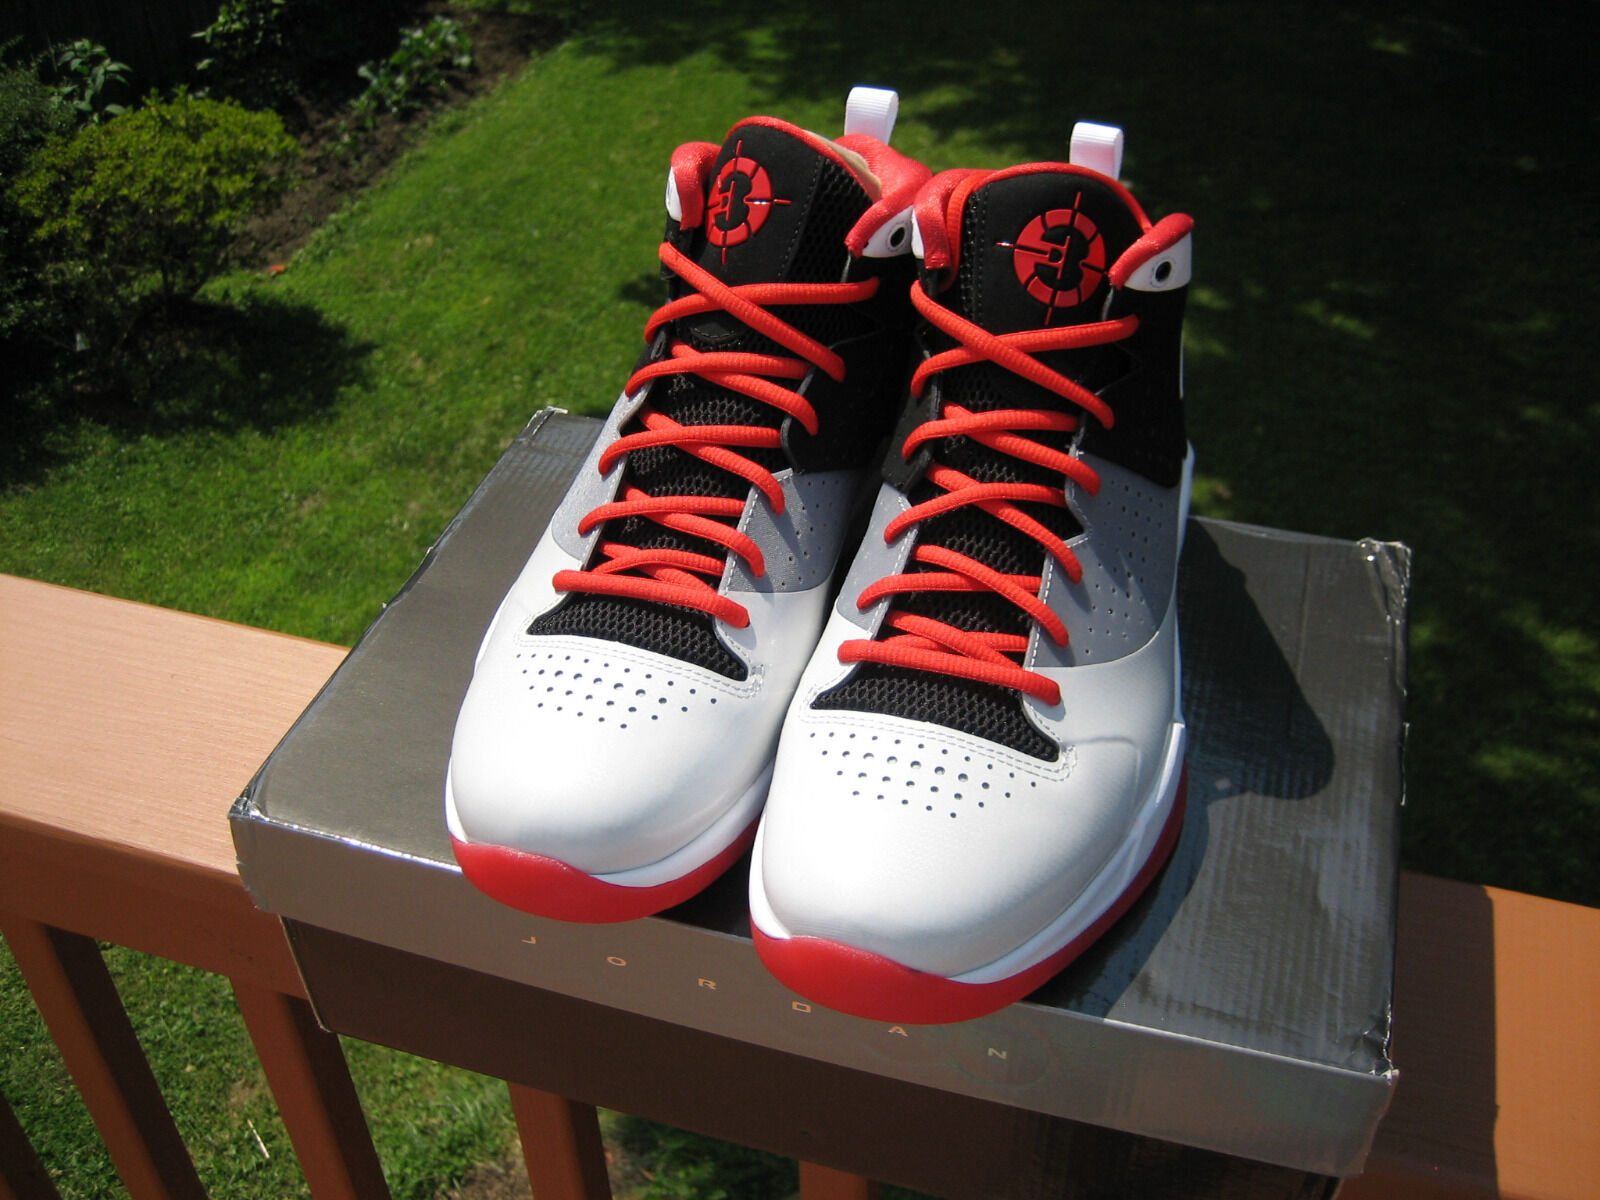 Jordan Fly Wade Size 9